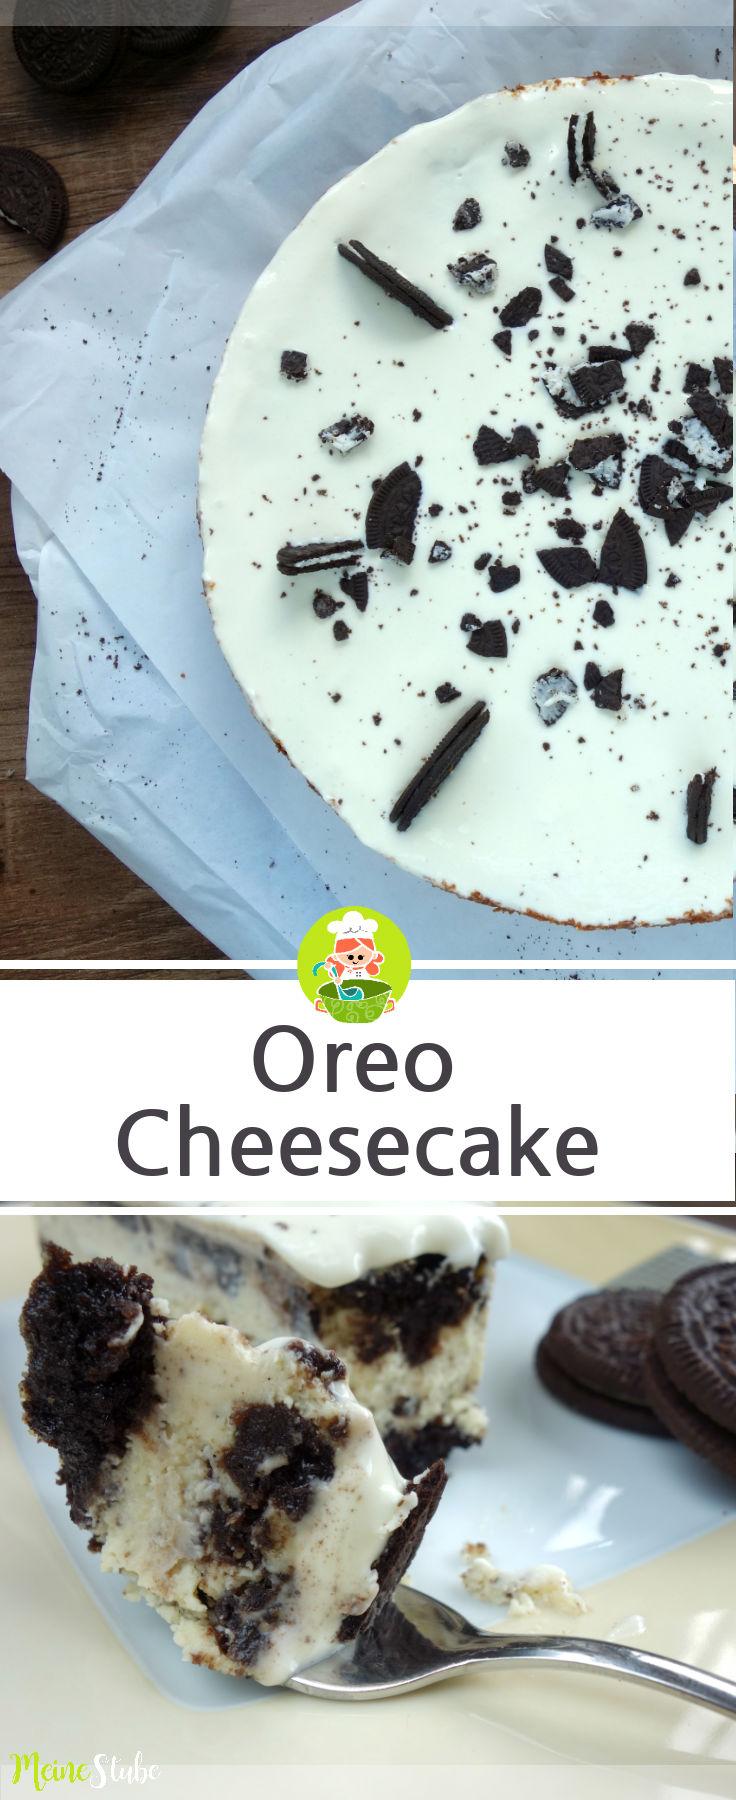 Oreo Cheesecake Ein Kasekuchen Aus Oreo Keksen Meine Stube